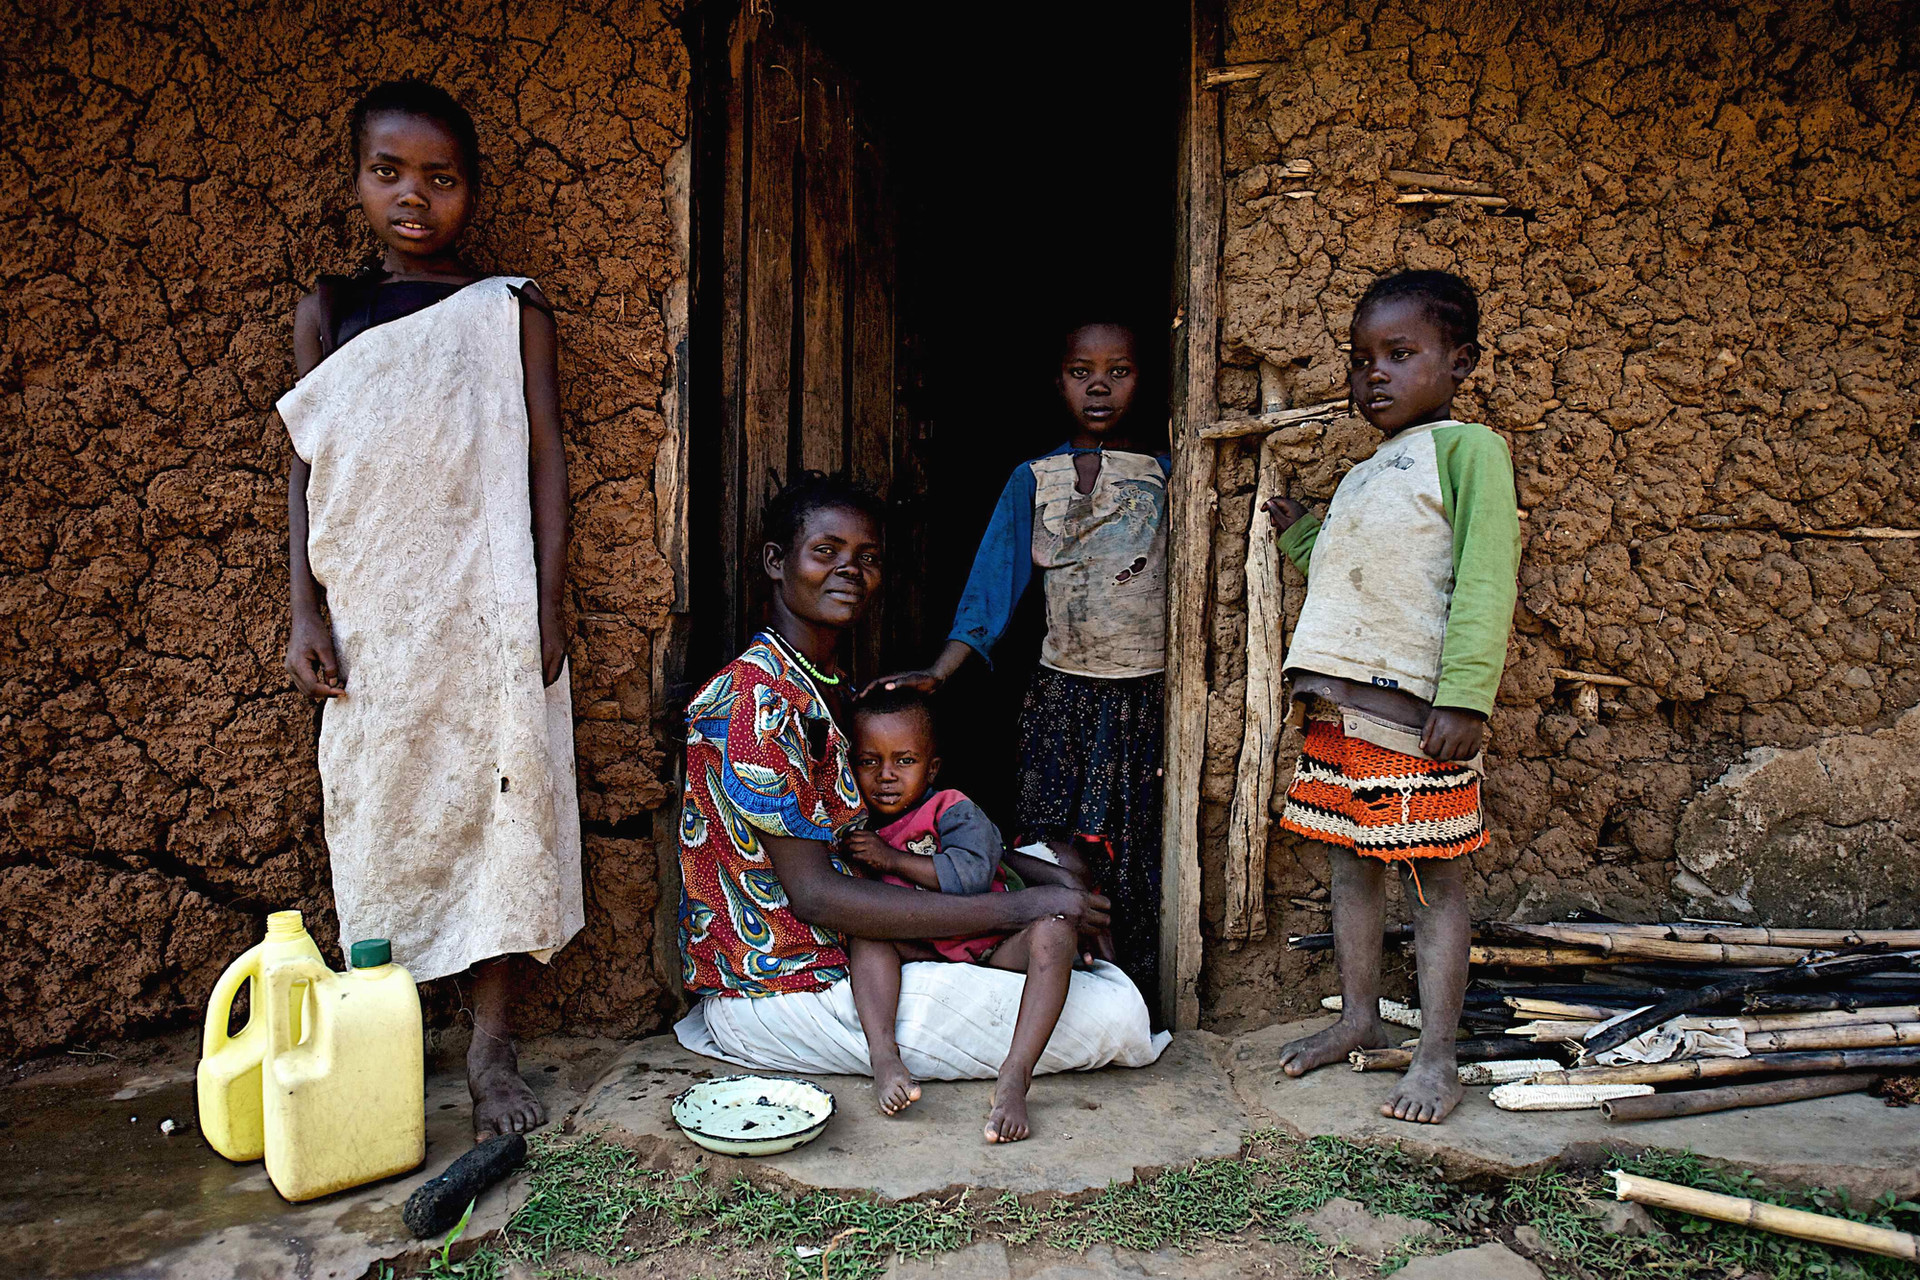 Portrait of a Kenyan Family